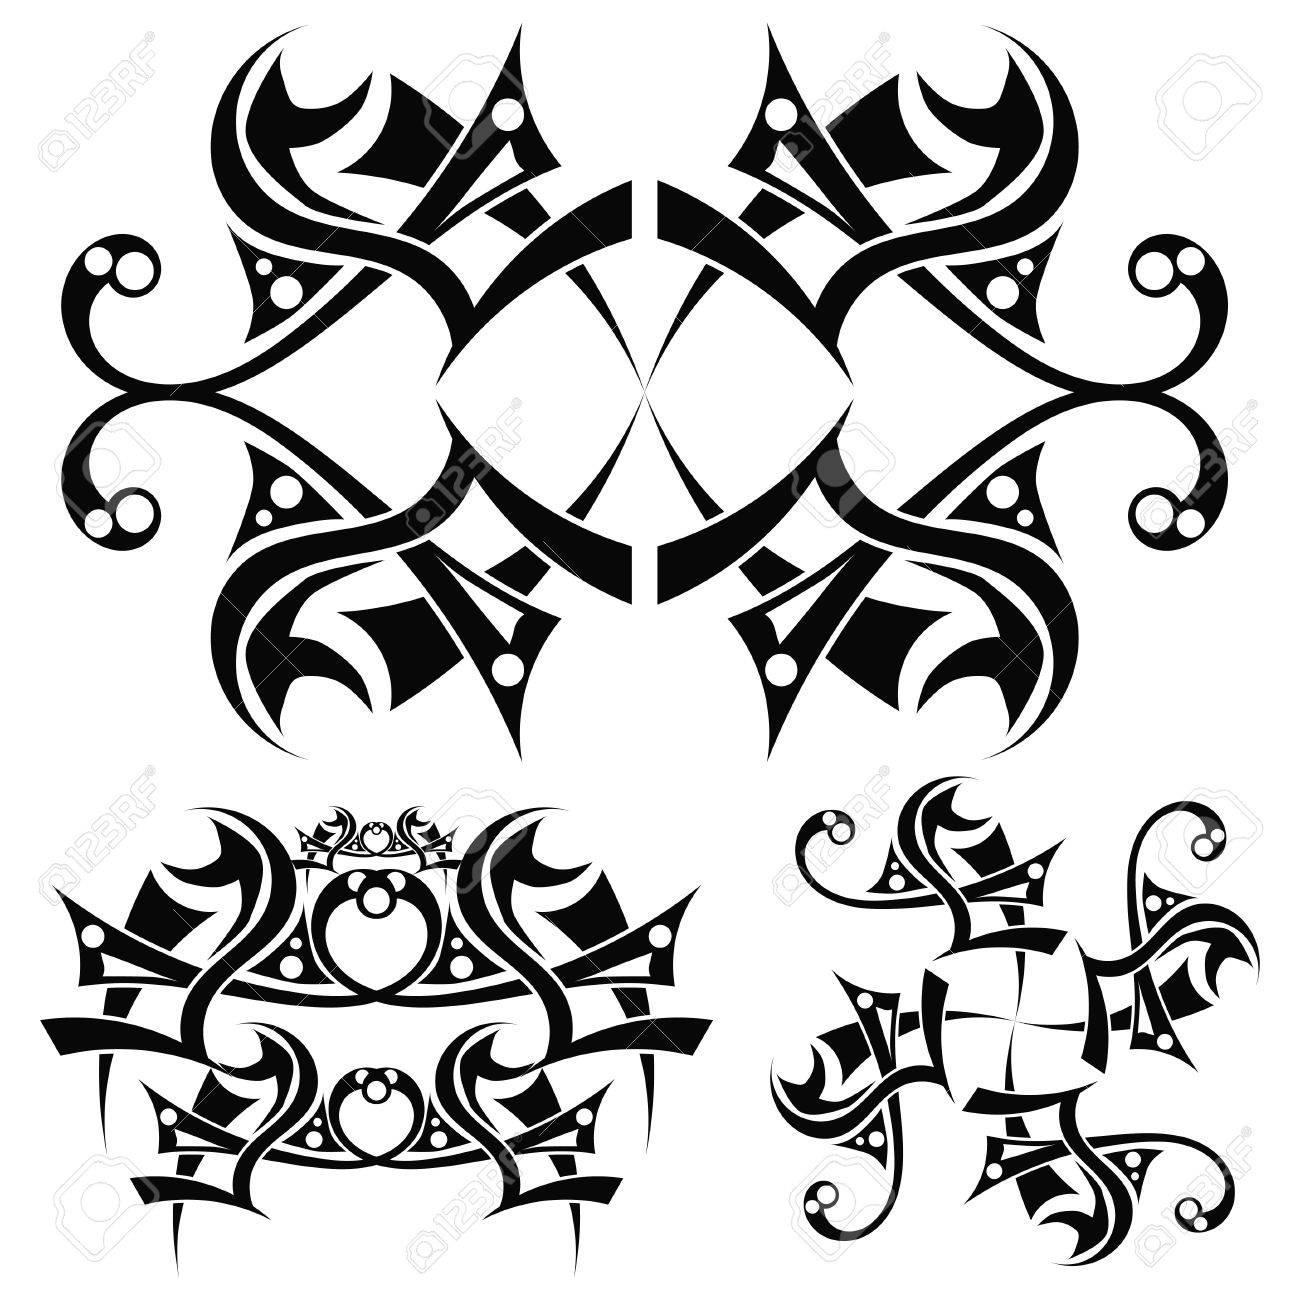 Tribal Art Design Stock Vector - 17900166